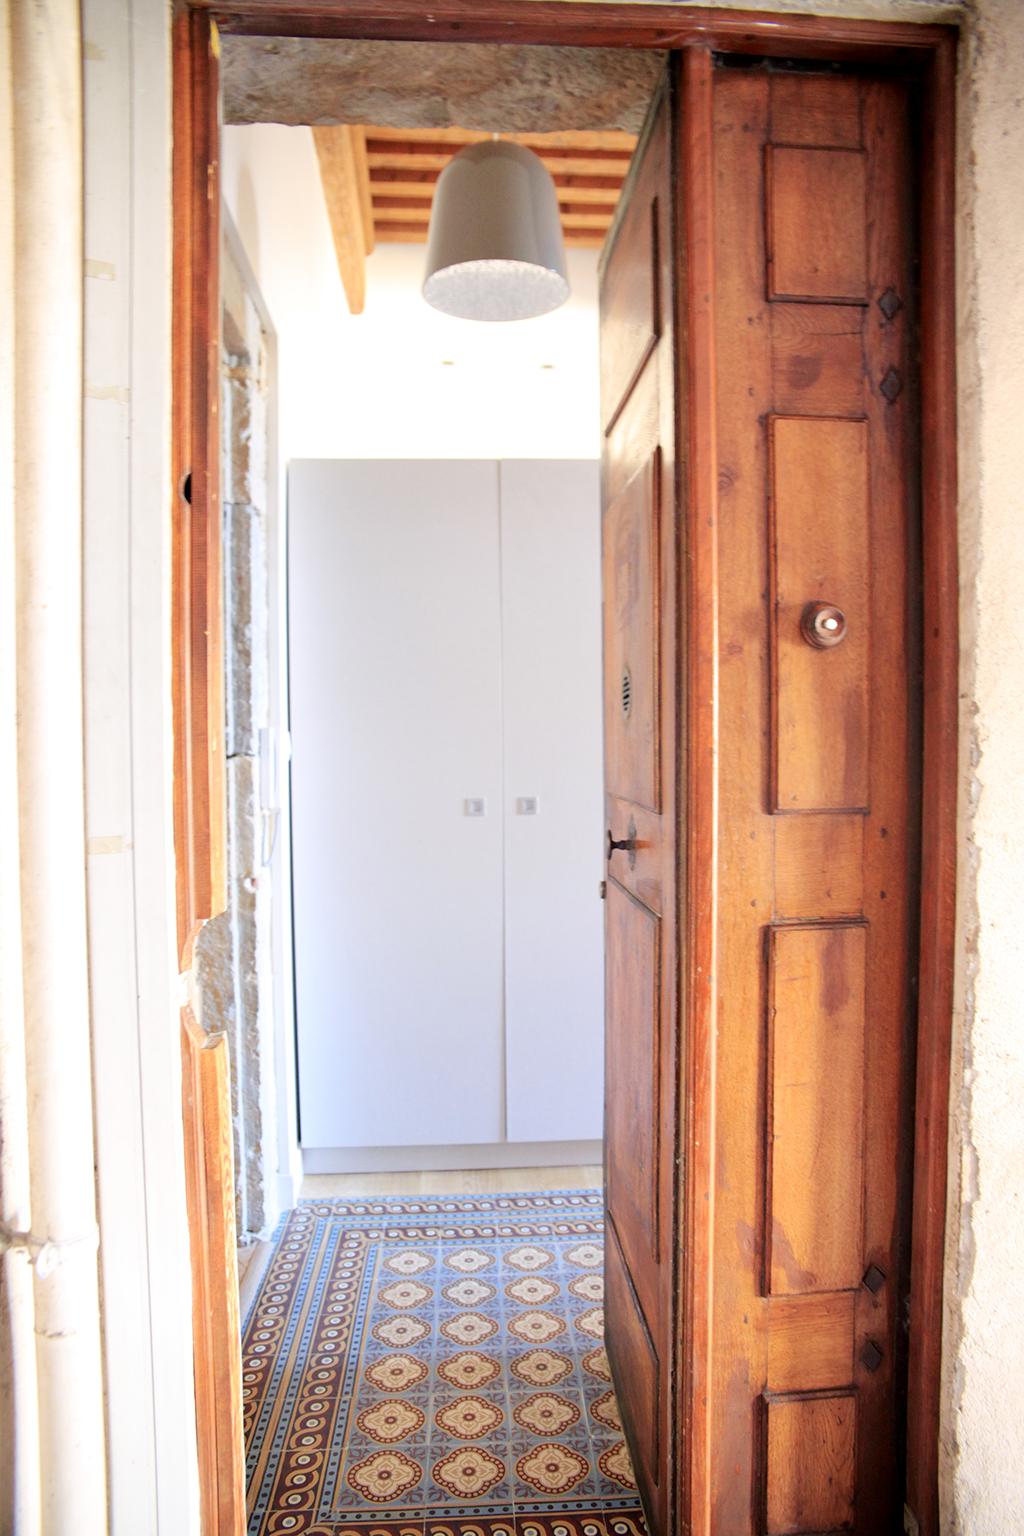 Un appartement transformé place Satonay, Lyon - Photo : Cillia Ciabrini